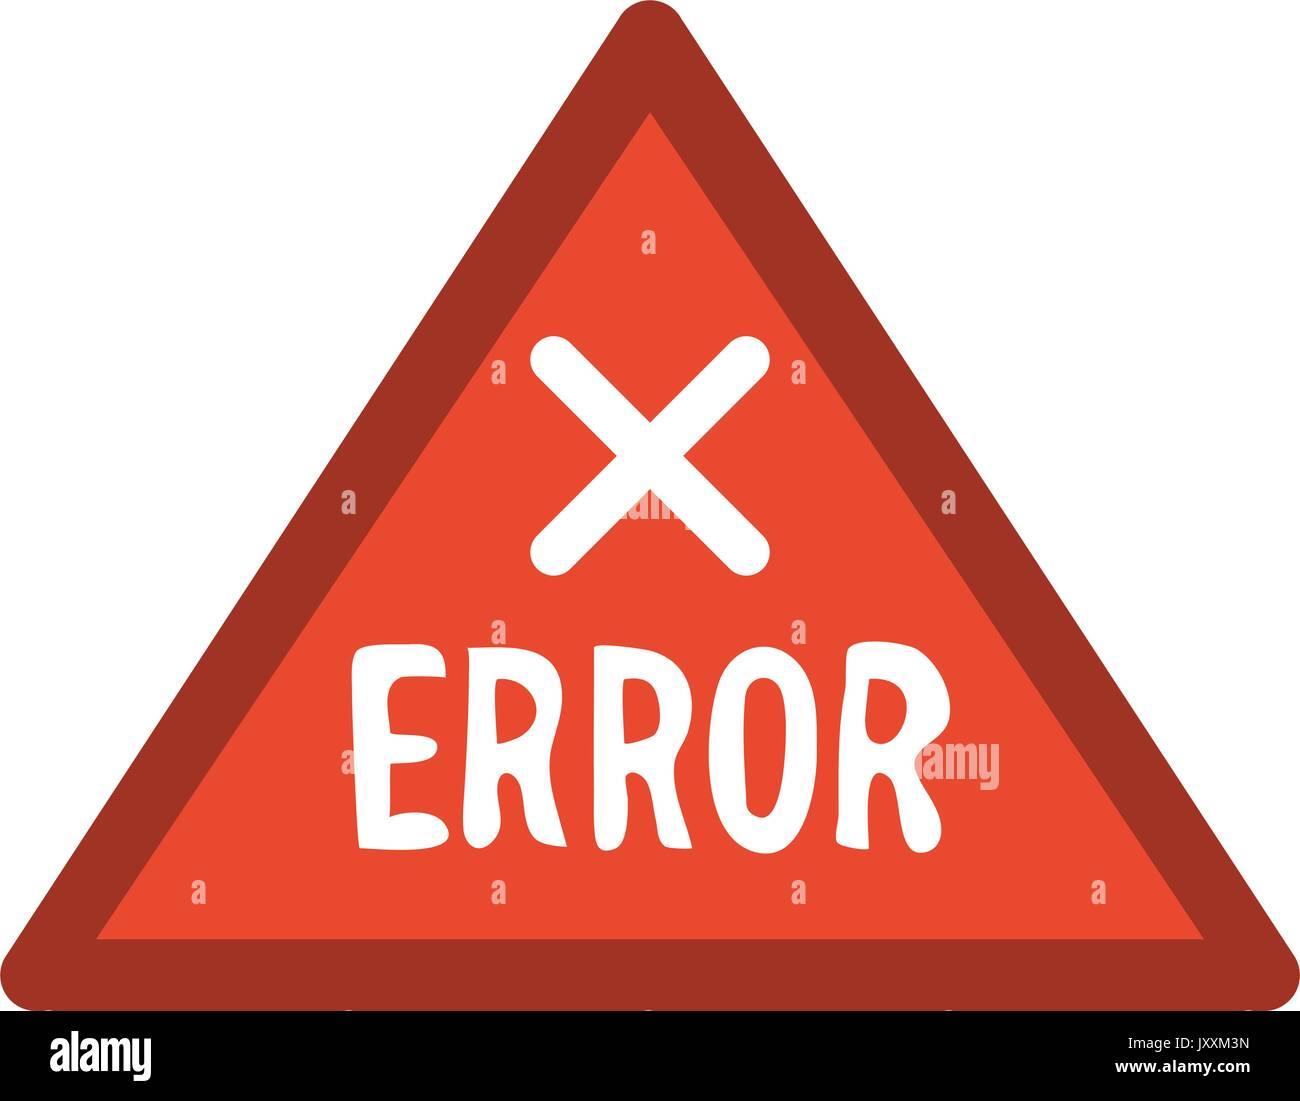 error sign icon image  - Stock Image